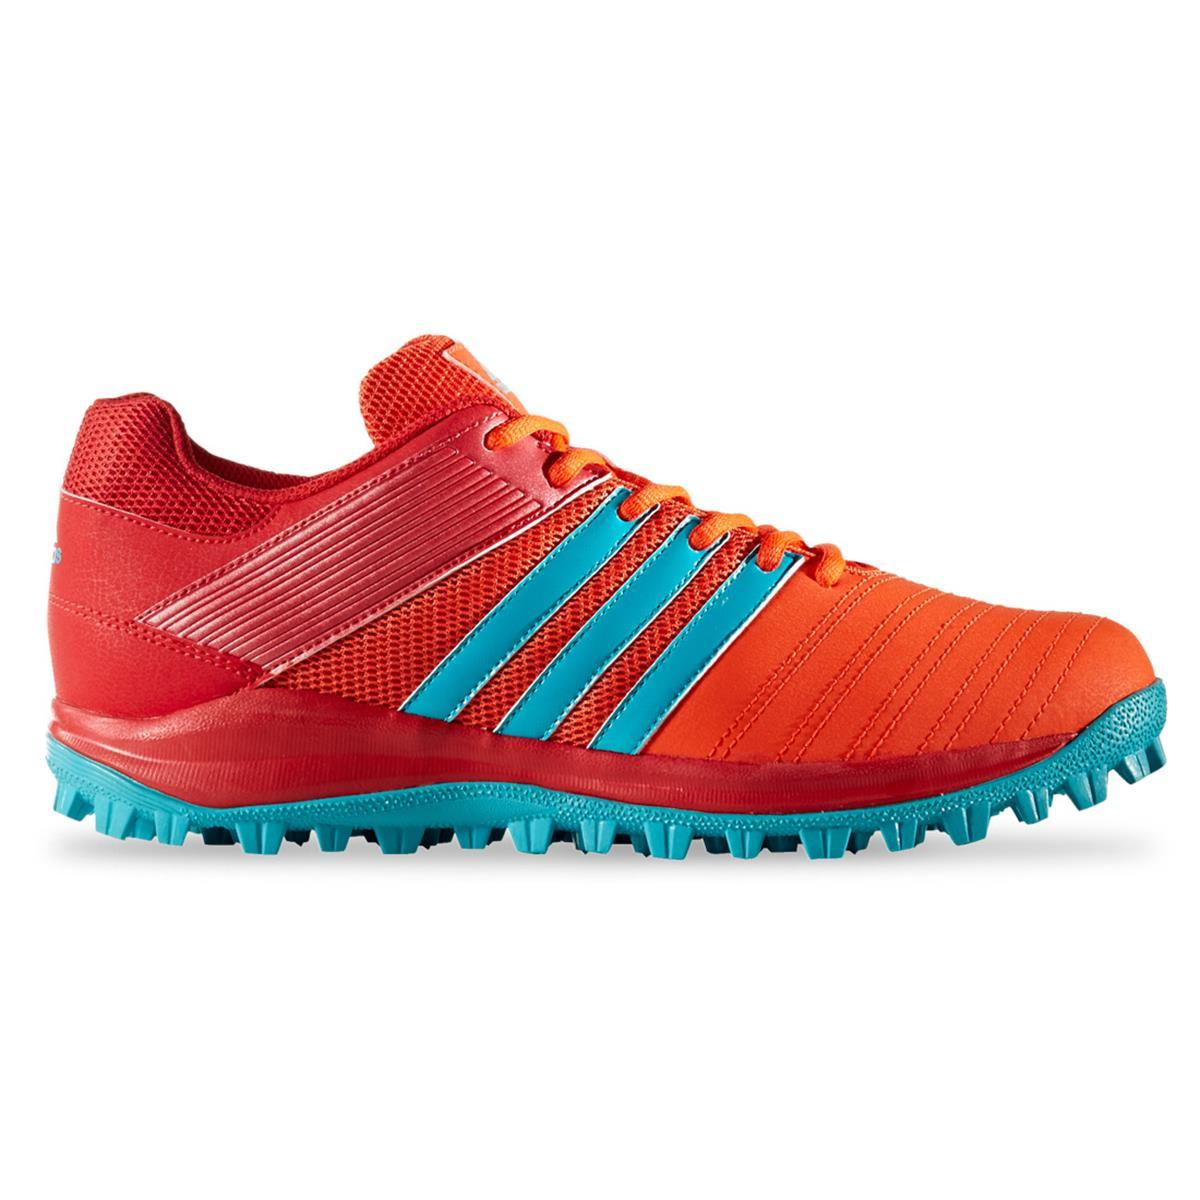 Adidas Srs  Women S Hockey Shoes